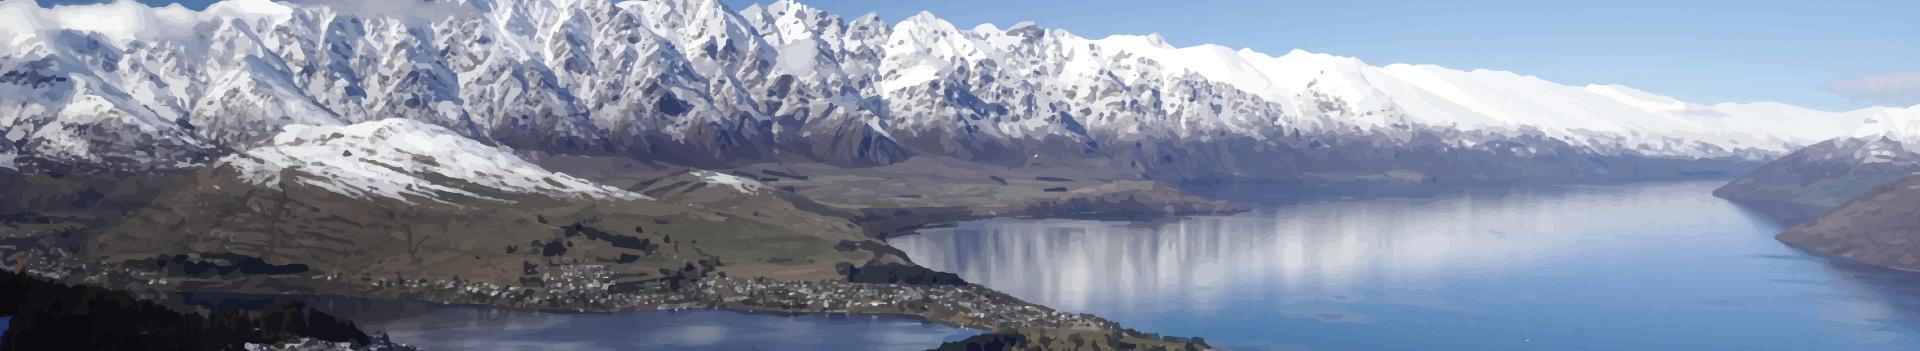 Kitesurfing in New Zealand